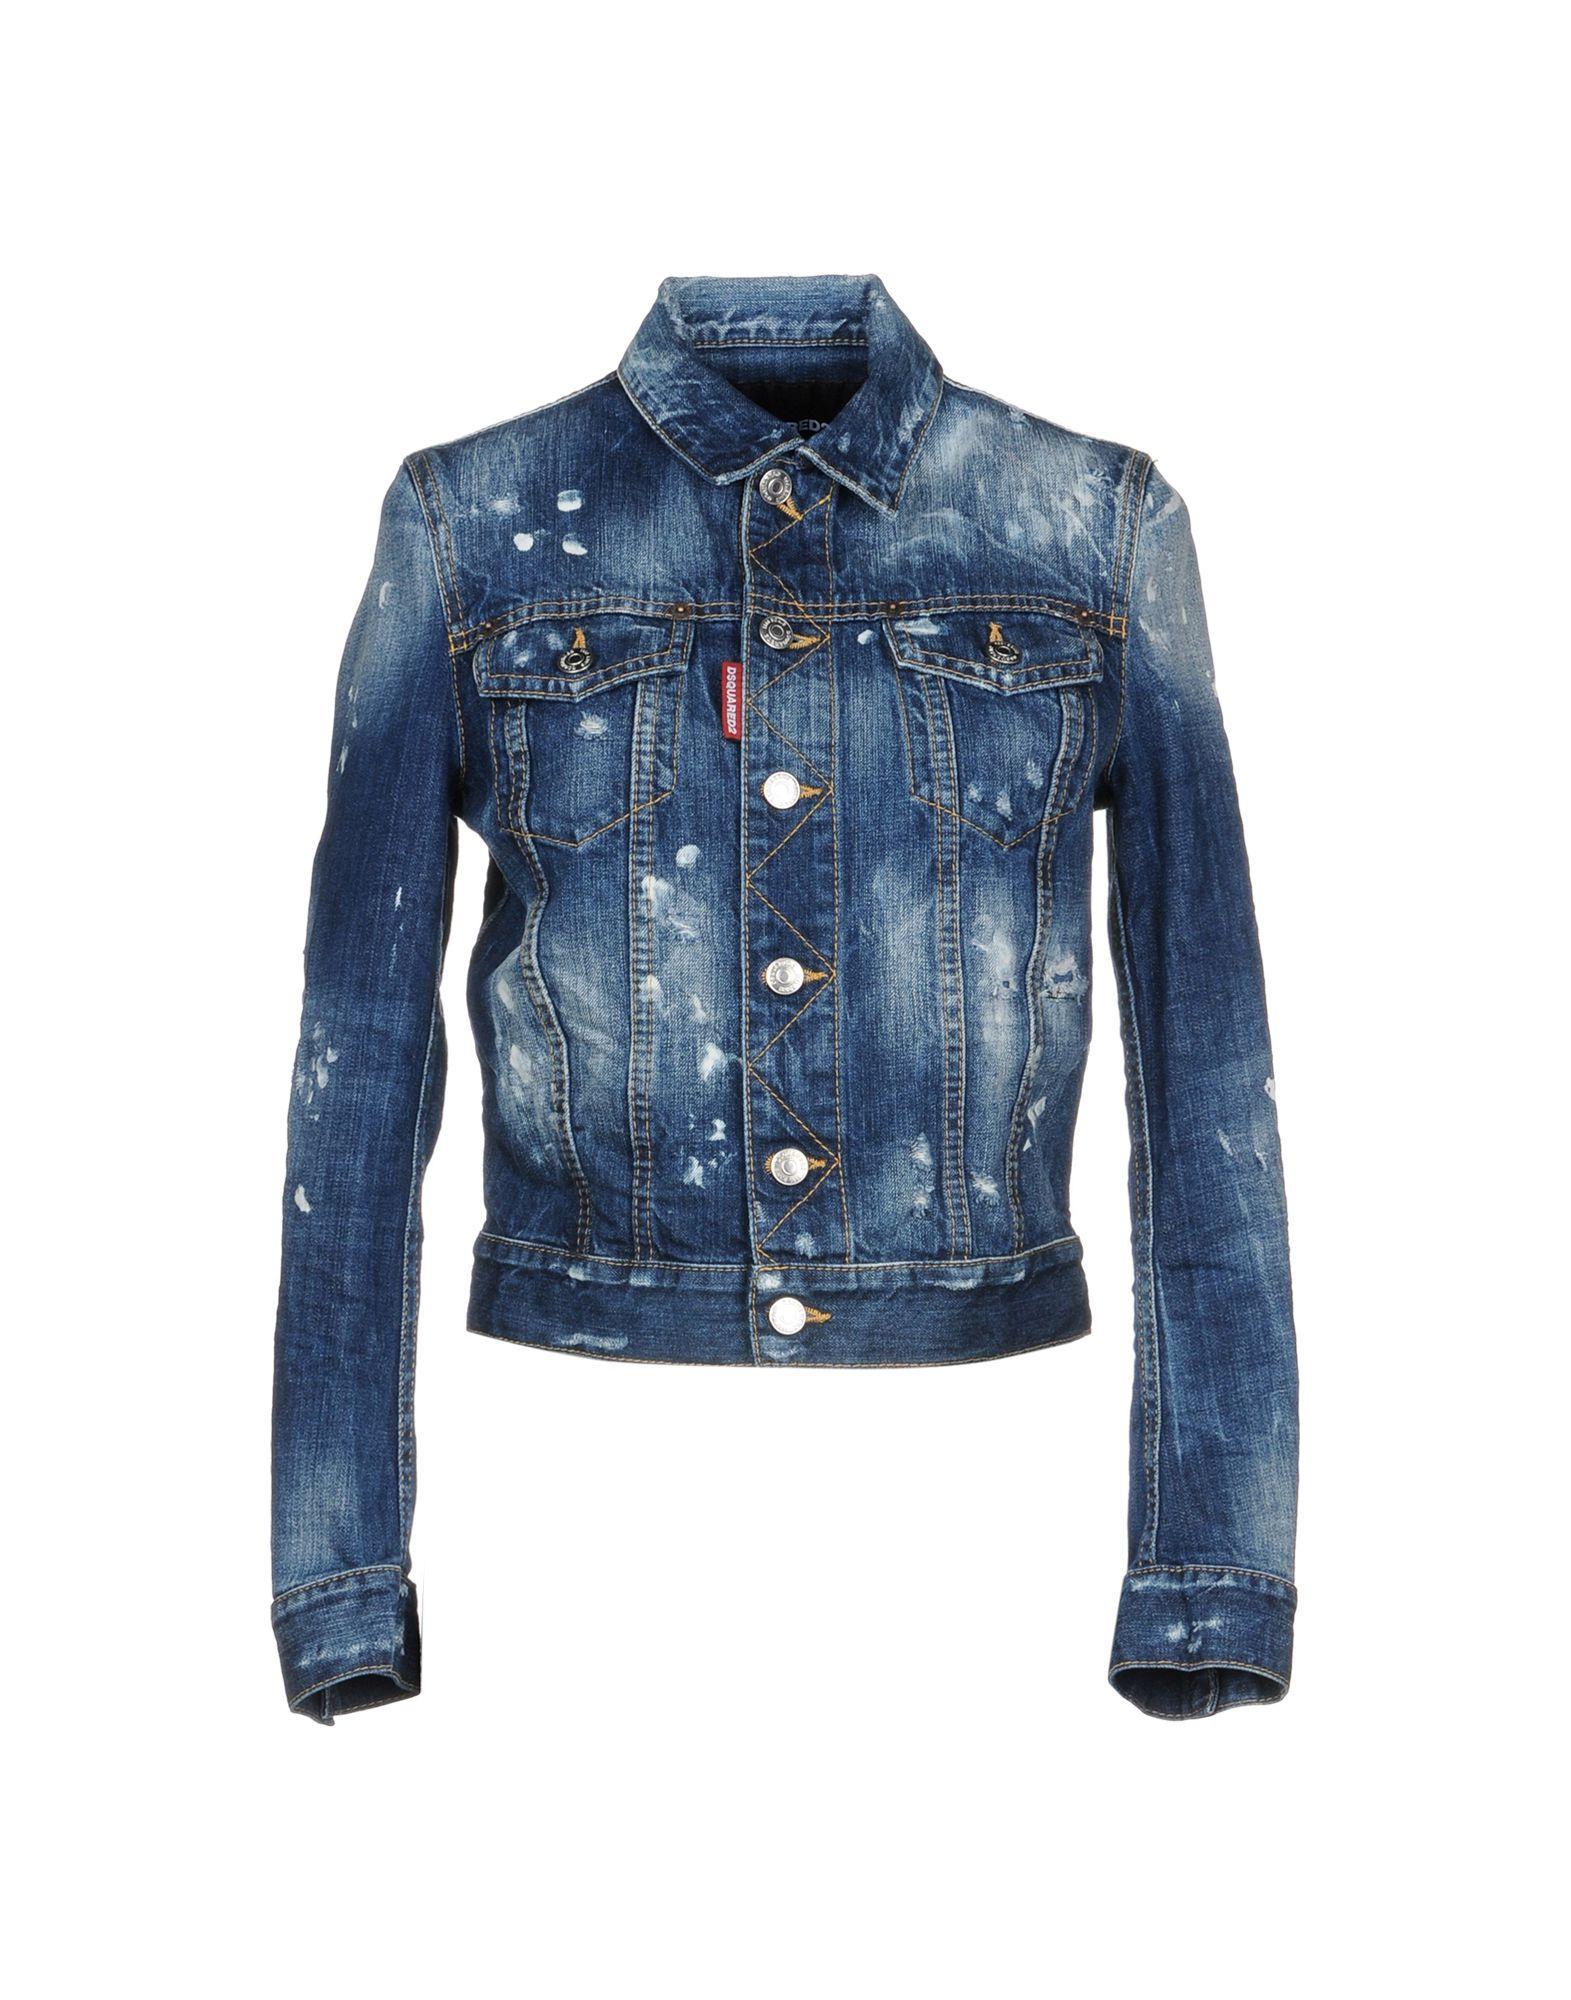 Dsquared2 Denim Outerwear In Blue